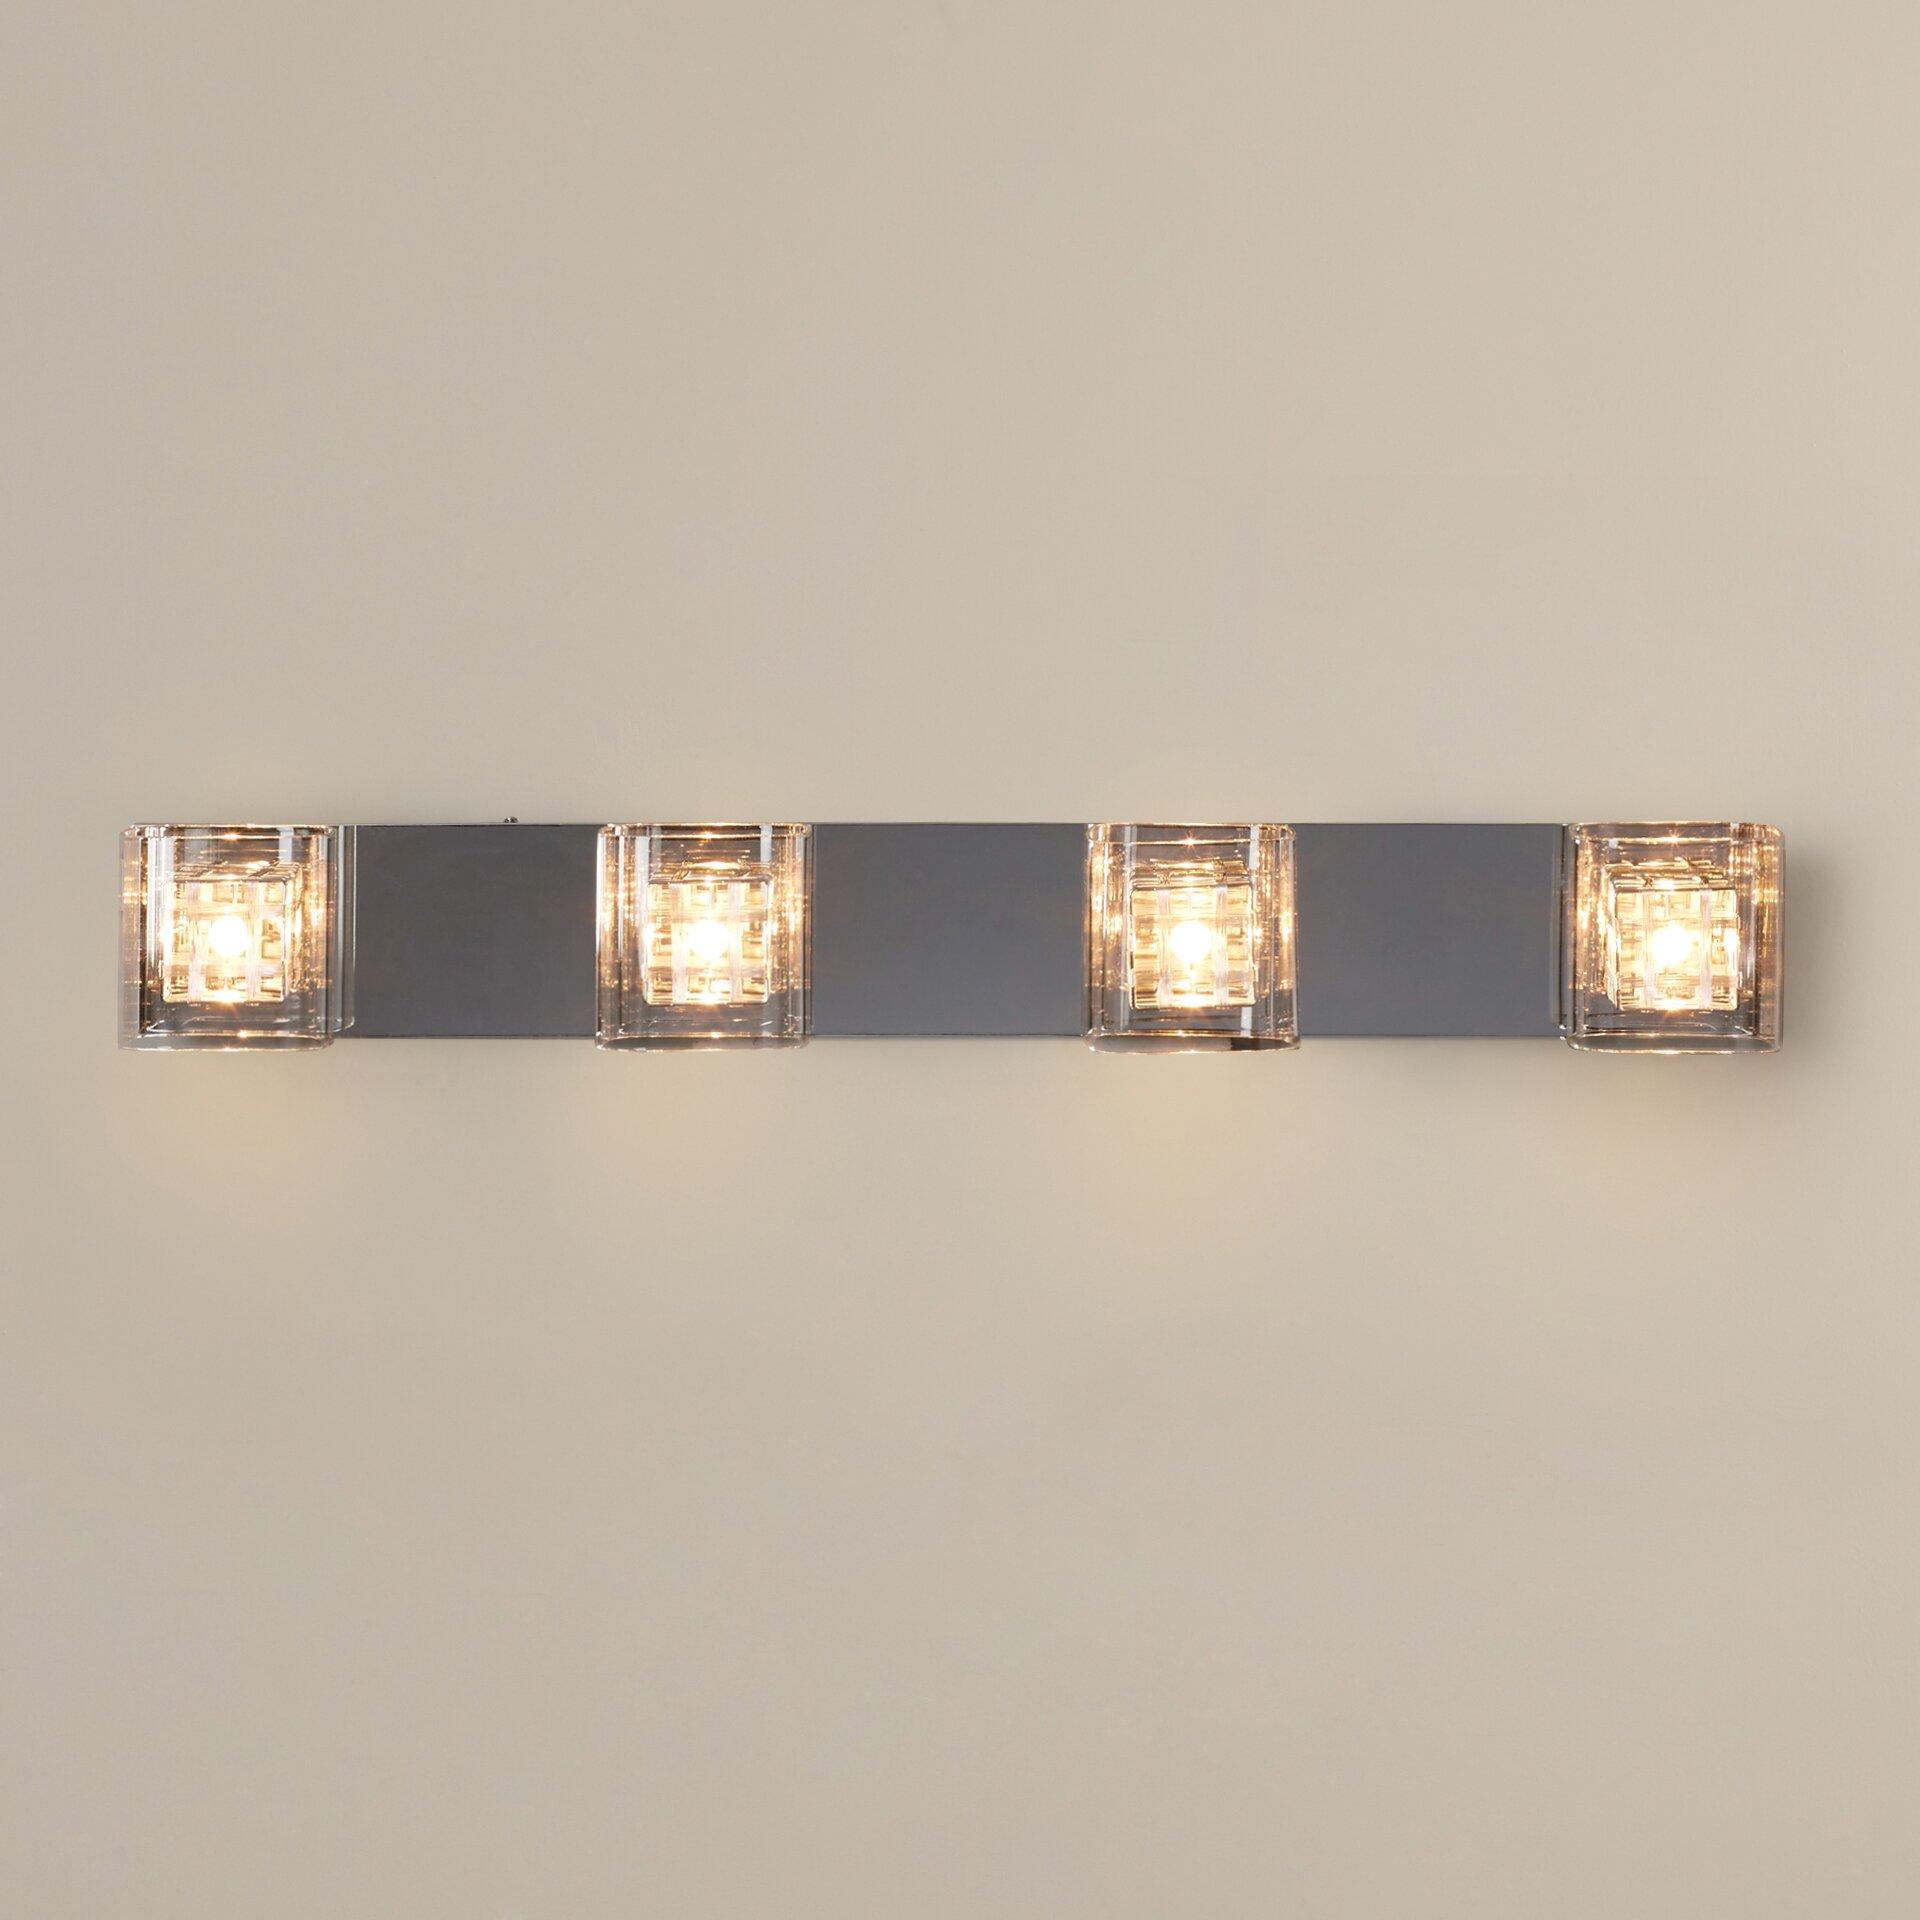 Vanity Lights Wayfair : House of Hampton Flynn 4 Light Vanity Light & Reviews Wayfair